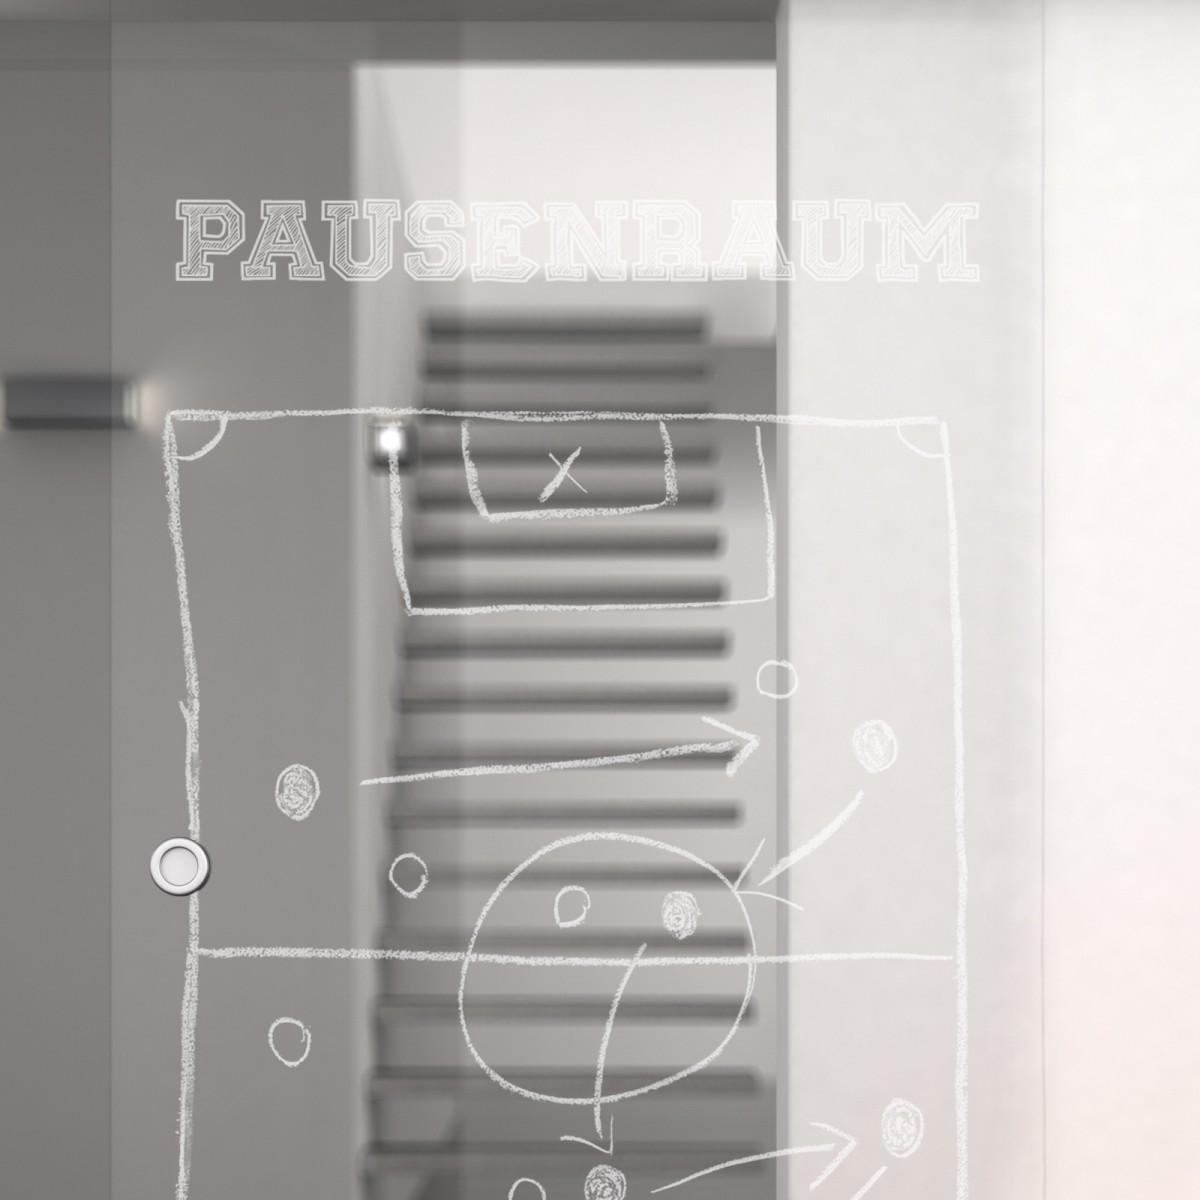 glas schiebet r mit motiv pausenraum 989708004. Black Bedroom Furniture Sets. Home Design Ideas